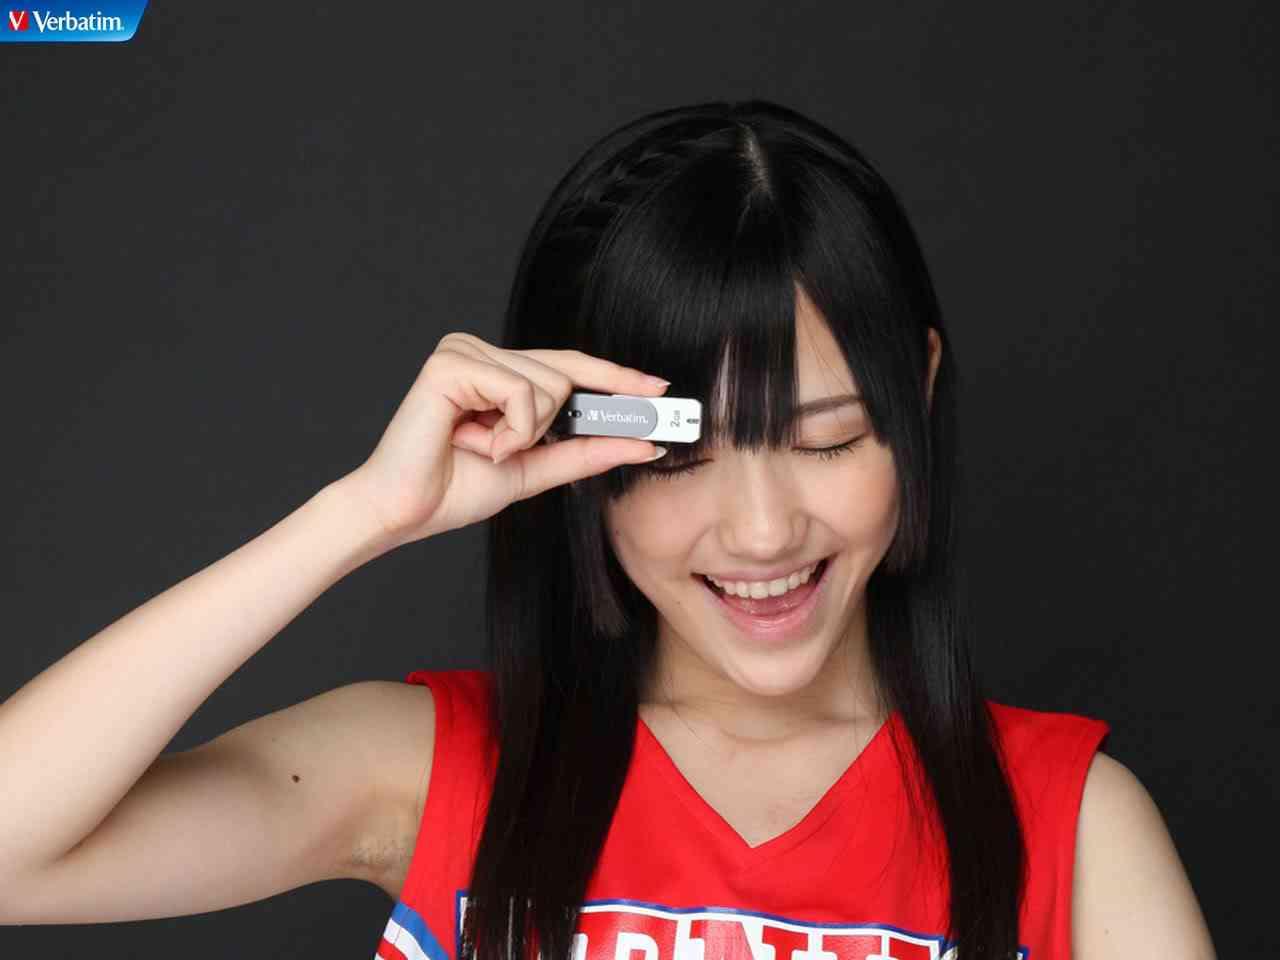 AKB48・渡辺麻友のワキがジョリ腋過ぎる